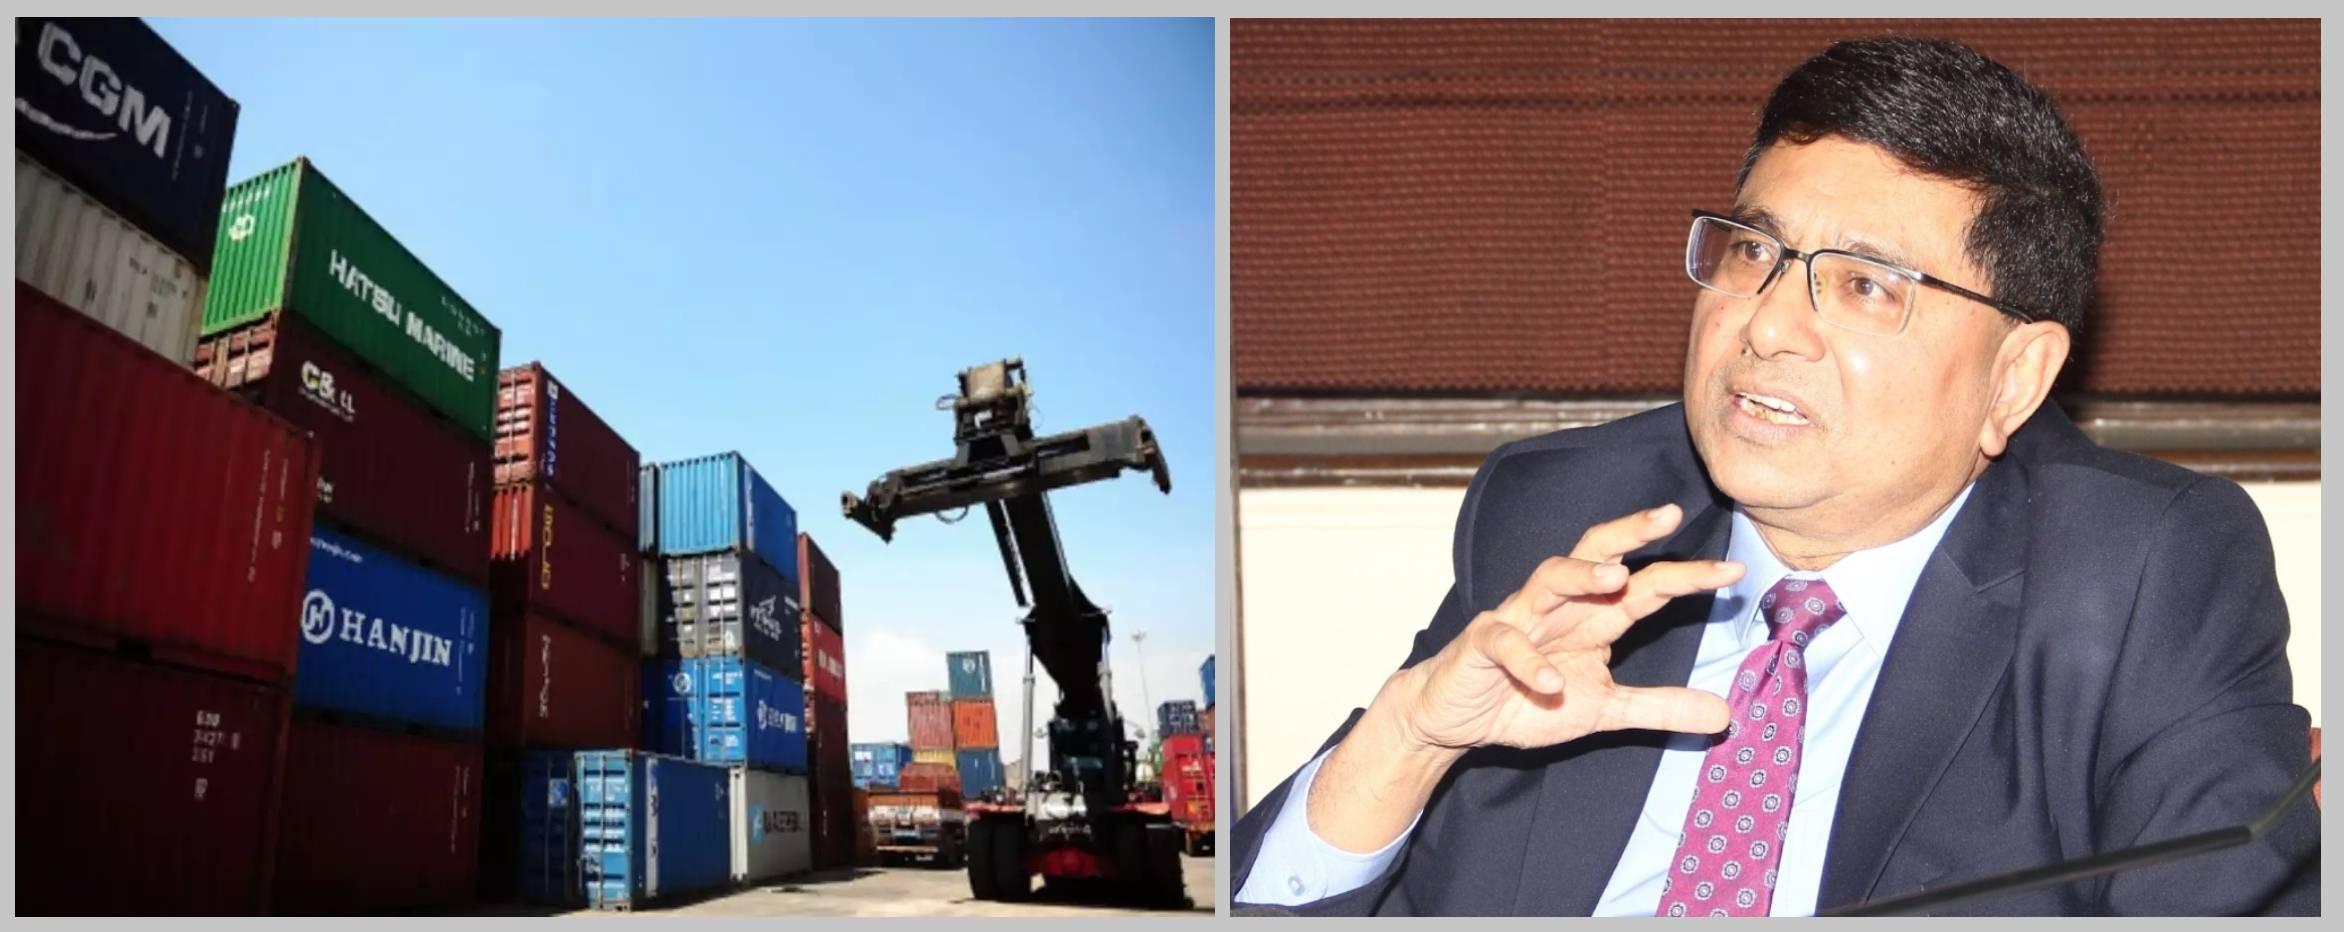 Sanjay Budhia on Exporters Seeking Relief Amid COVID-19